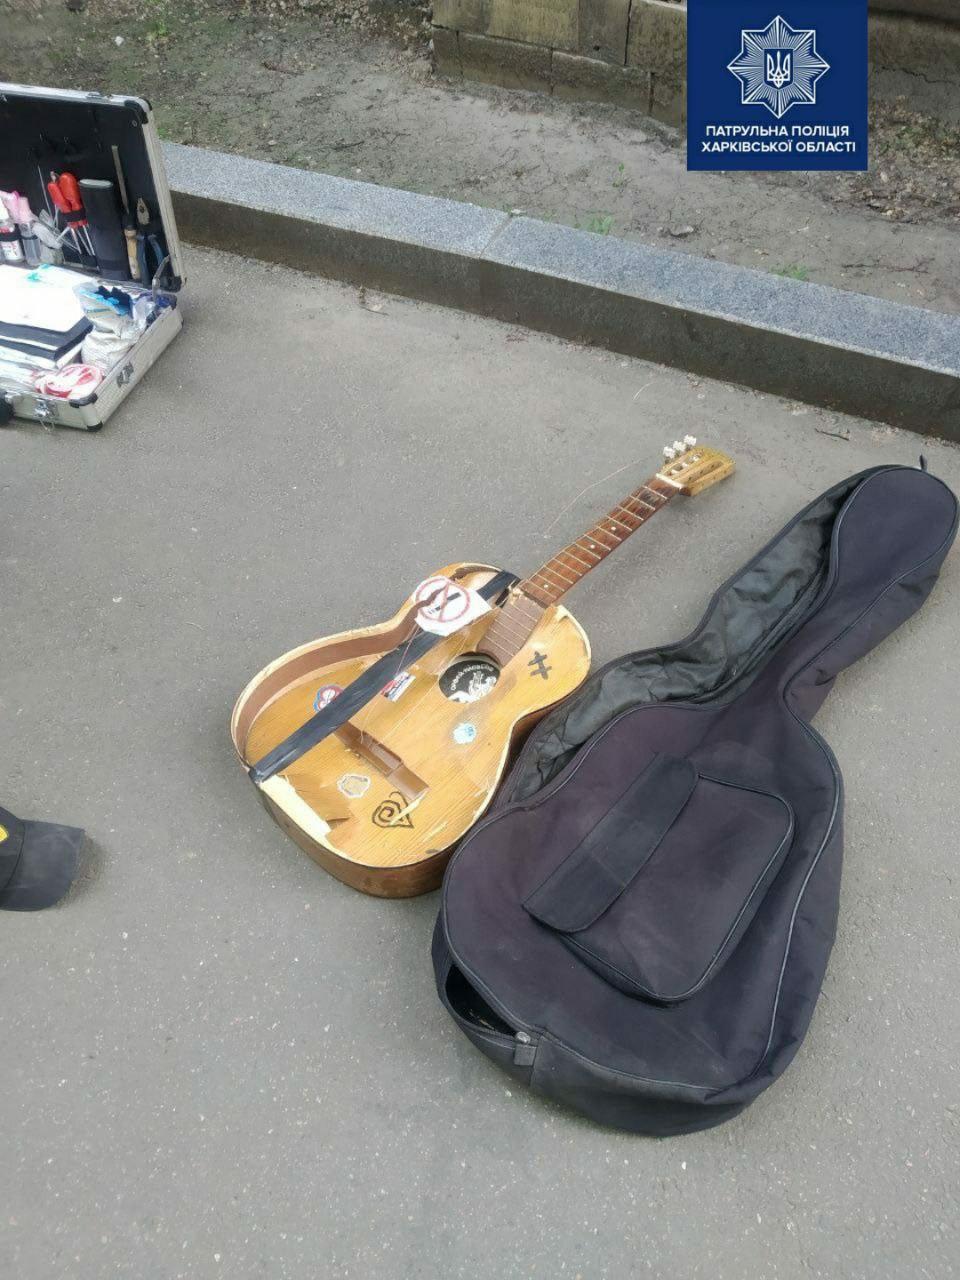 Харьковчанину не понравился внешний вид уличного музыканта